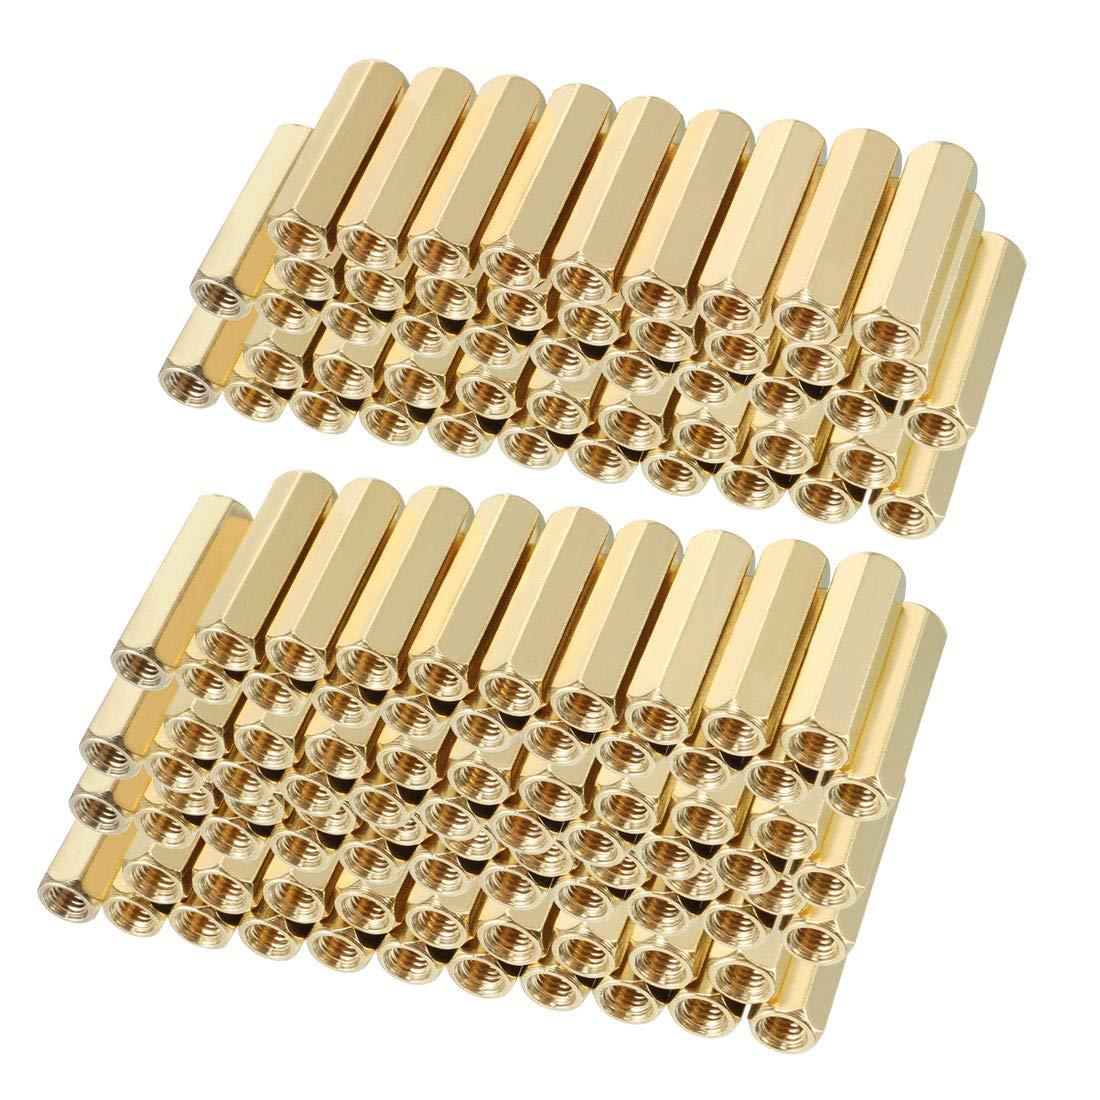 uxcell 120pcs Brass Straight PCB Pillar Female Thread Hex Standoff Spacer M3x5x16mm